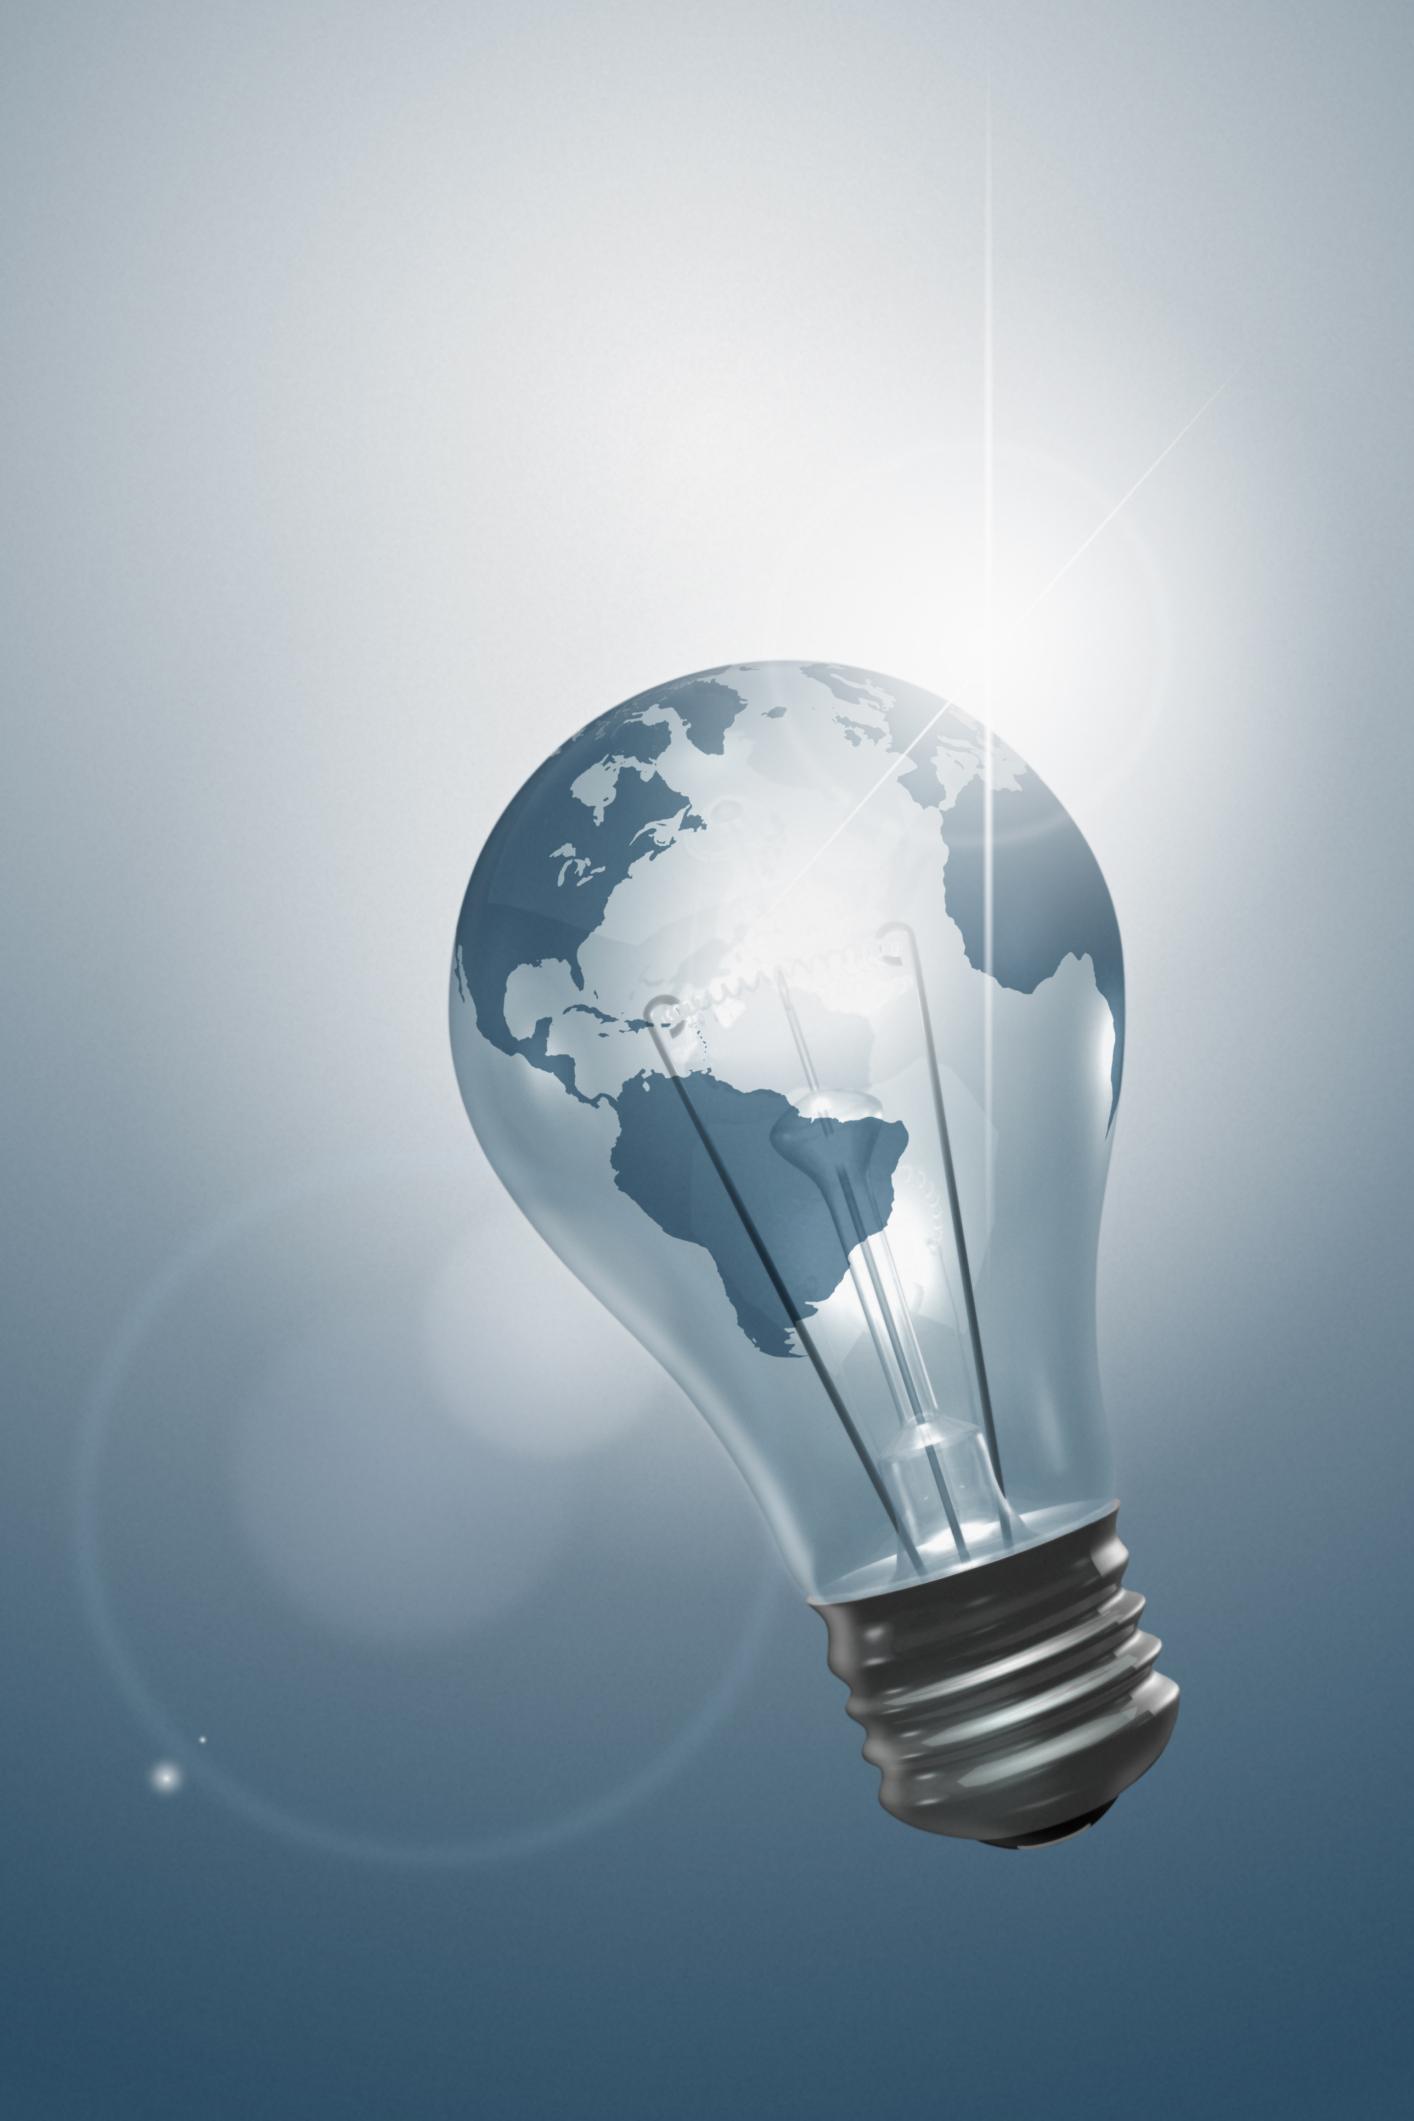 How to Make a Potato-Powered Light Bulb | Sciencing